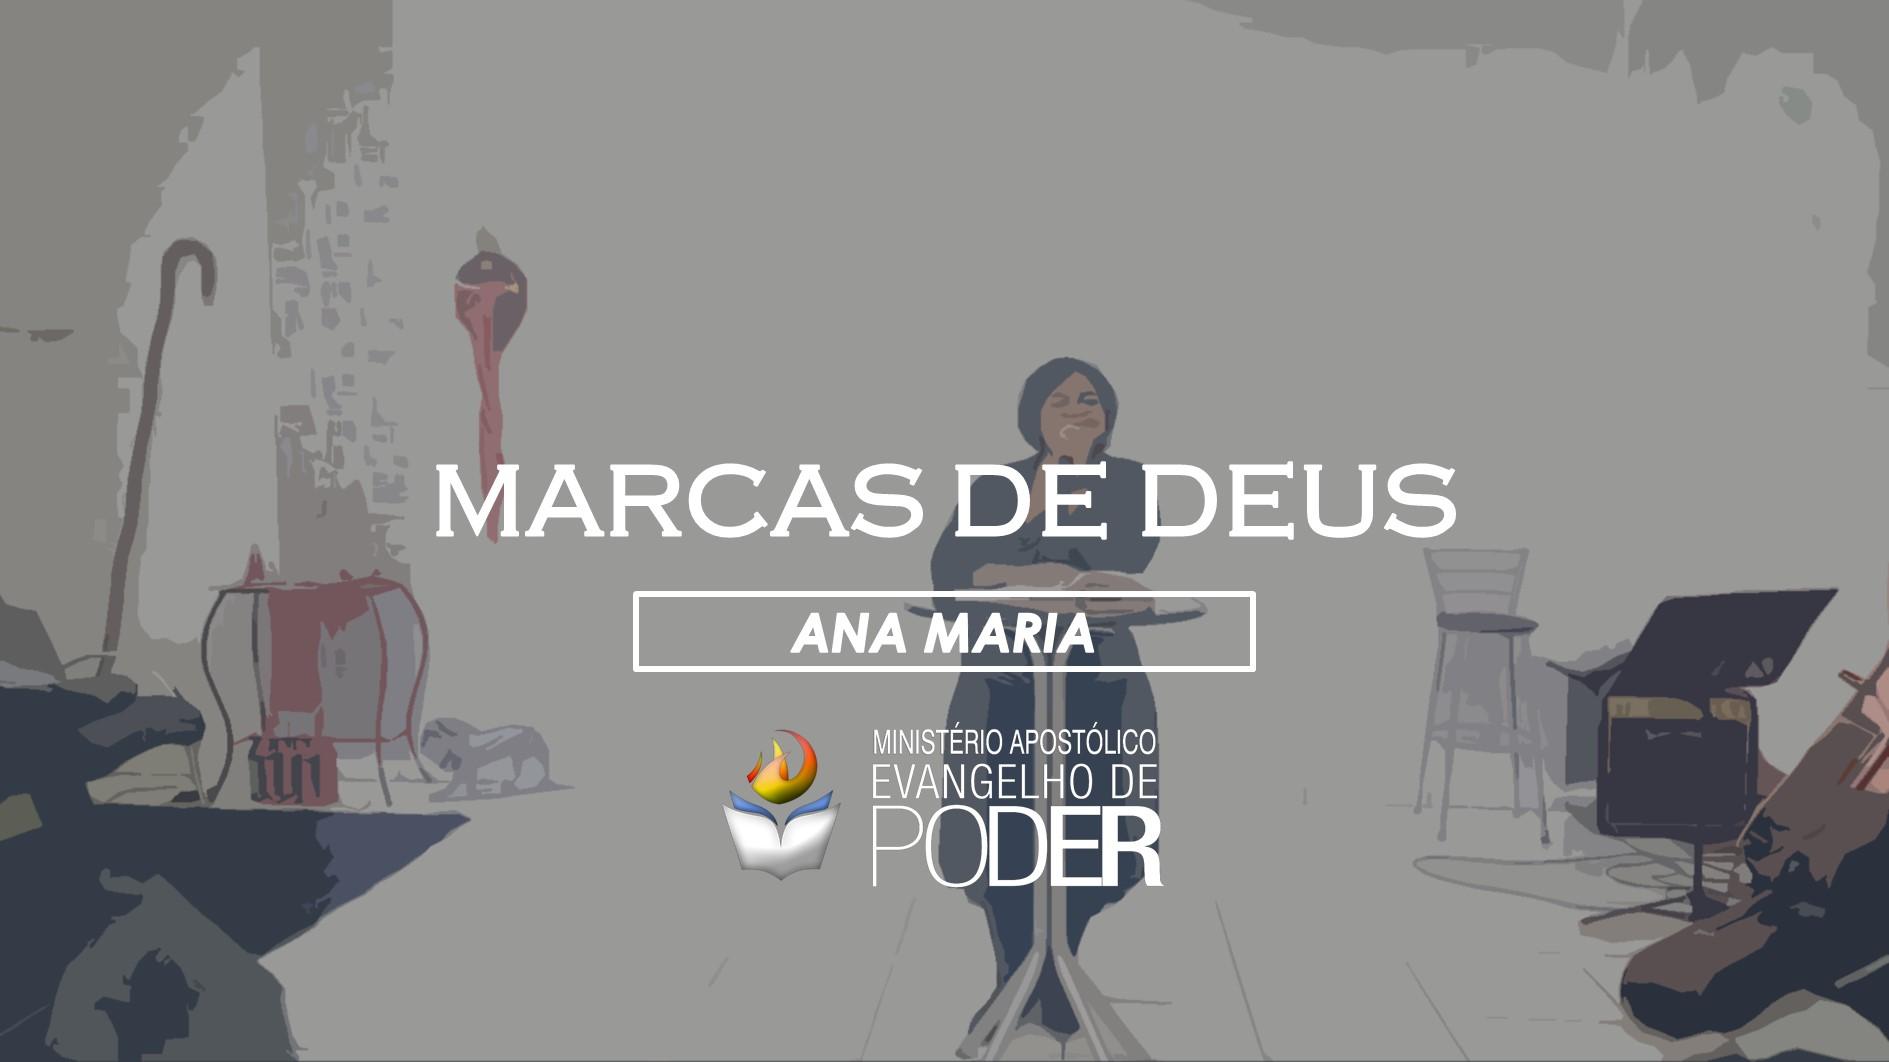 MARCAS DE DEUS - ANA MARIA